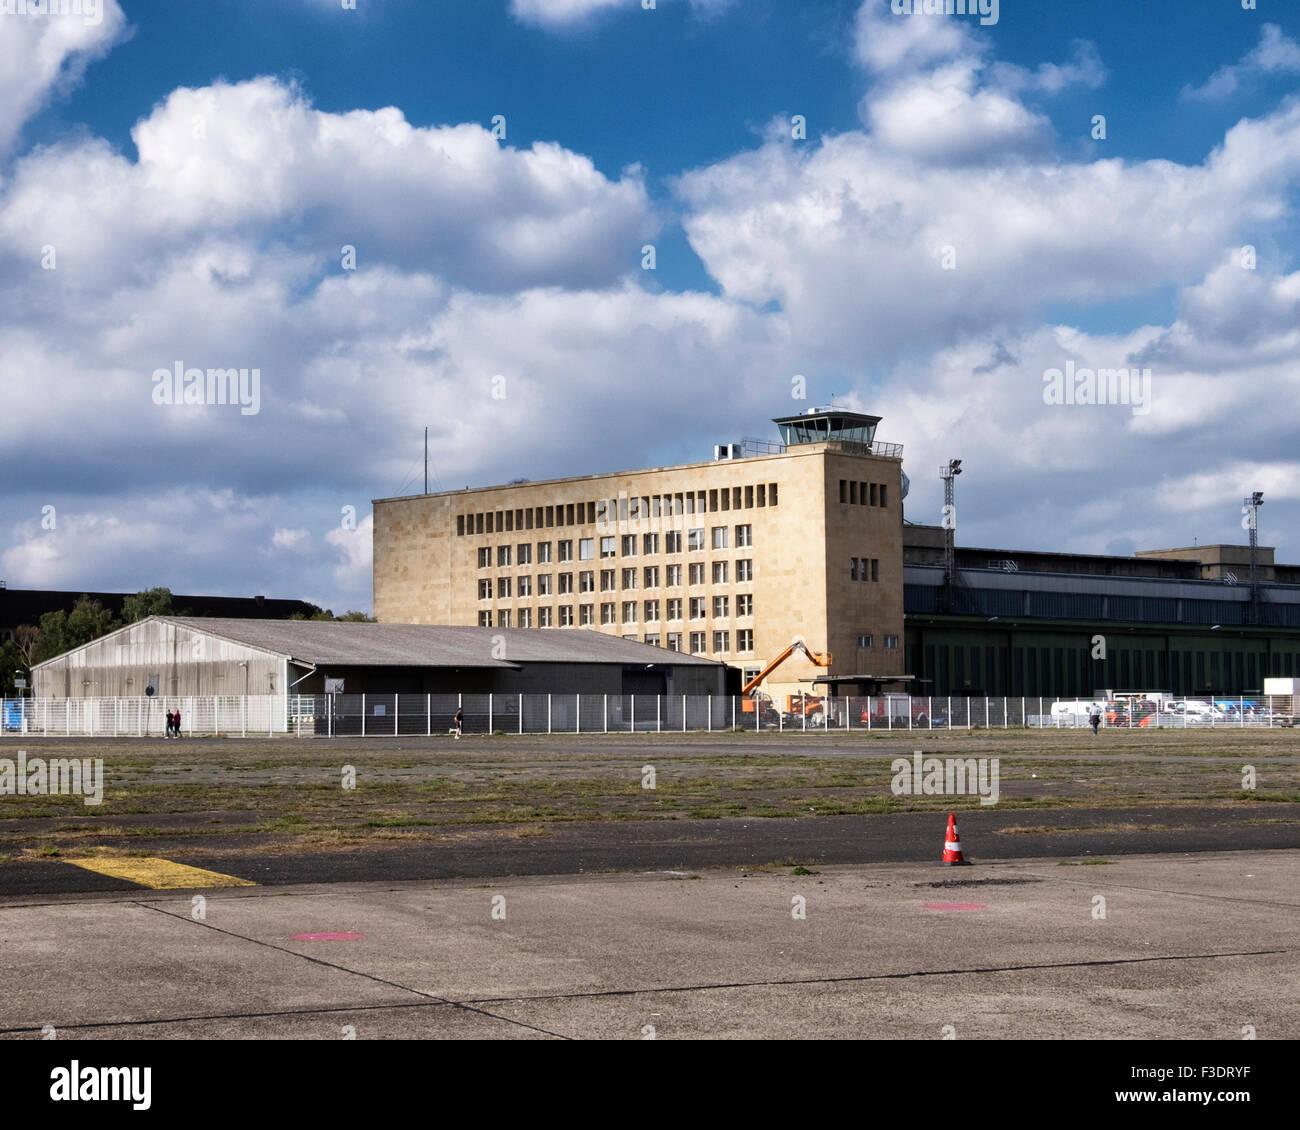 Berlin Tempelhof Airport, Flughafen Berlin-Tempelhof THF, obsolete former airport buildings and runway - Stock Image